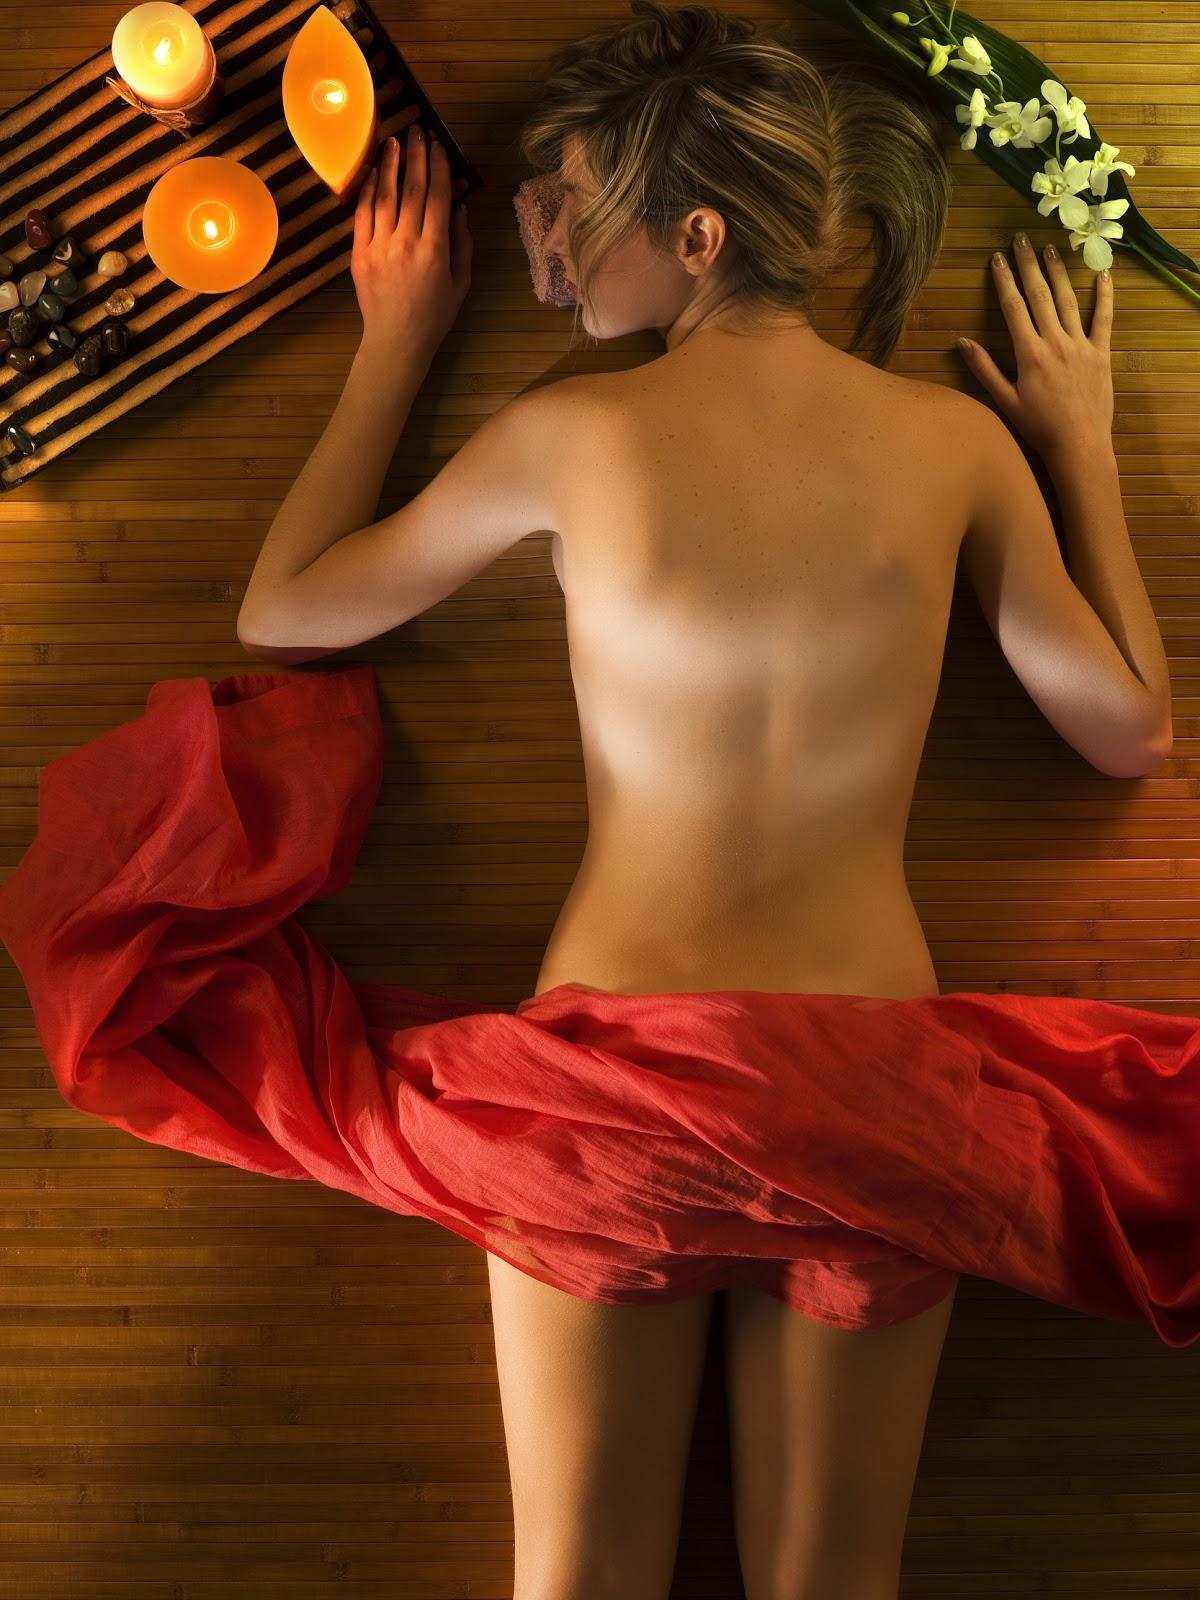 Hot tantric massage